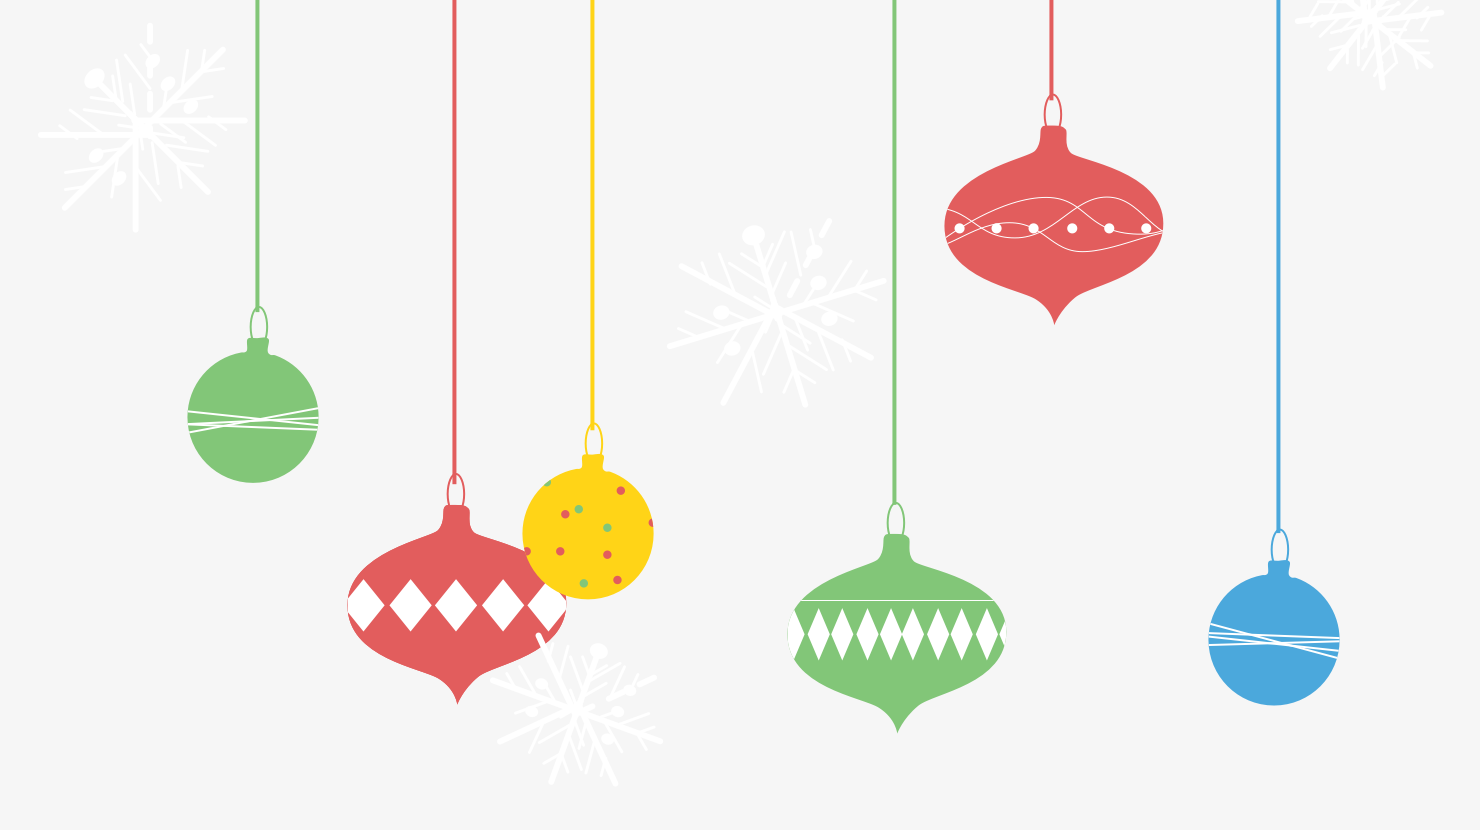 festive-article16x9.png